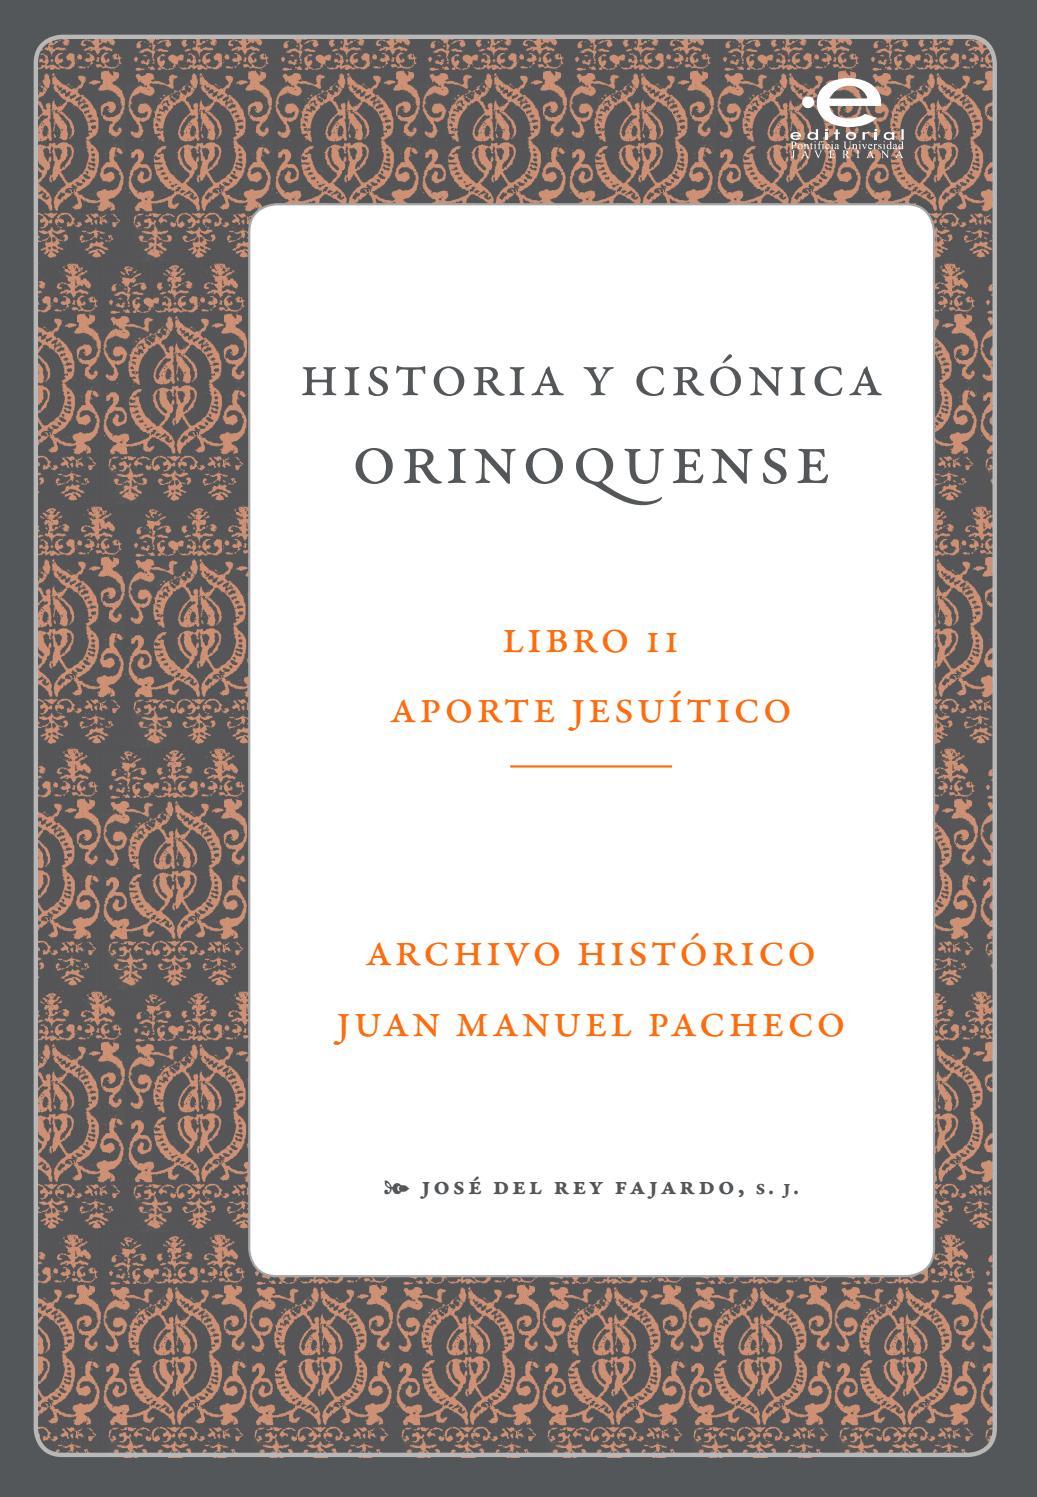 Historia y crónica orinoquense , Libro 2 Aporte Jesuítico by Archivo ...